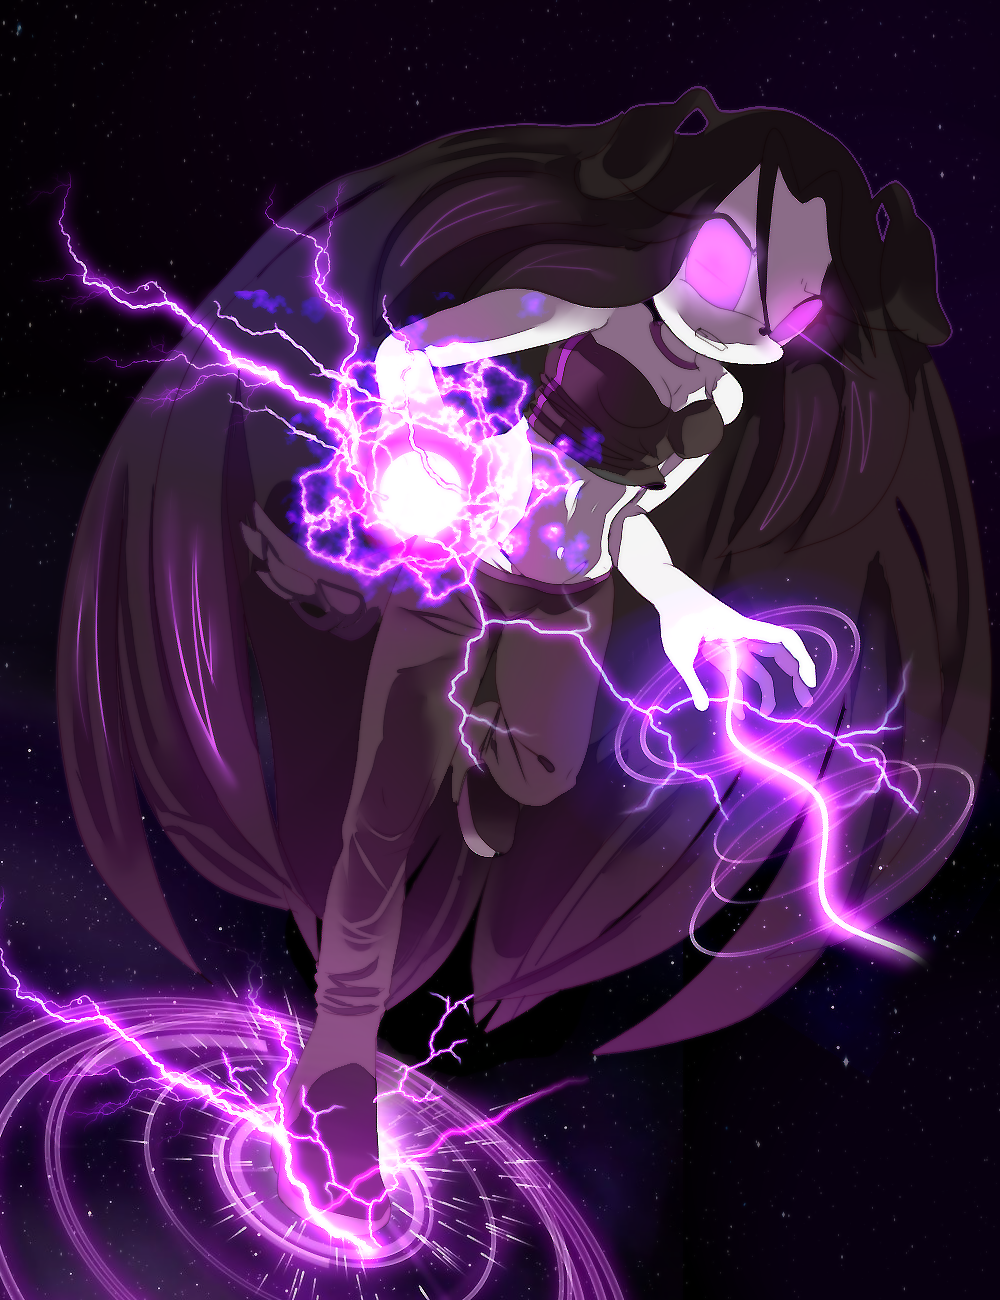 Dark Magic By Koda Soda On Deviantart